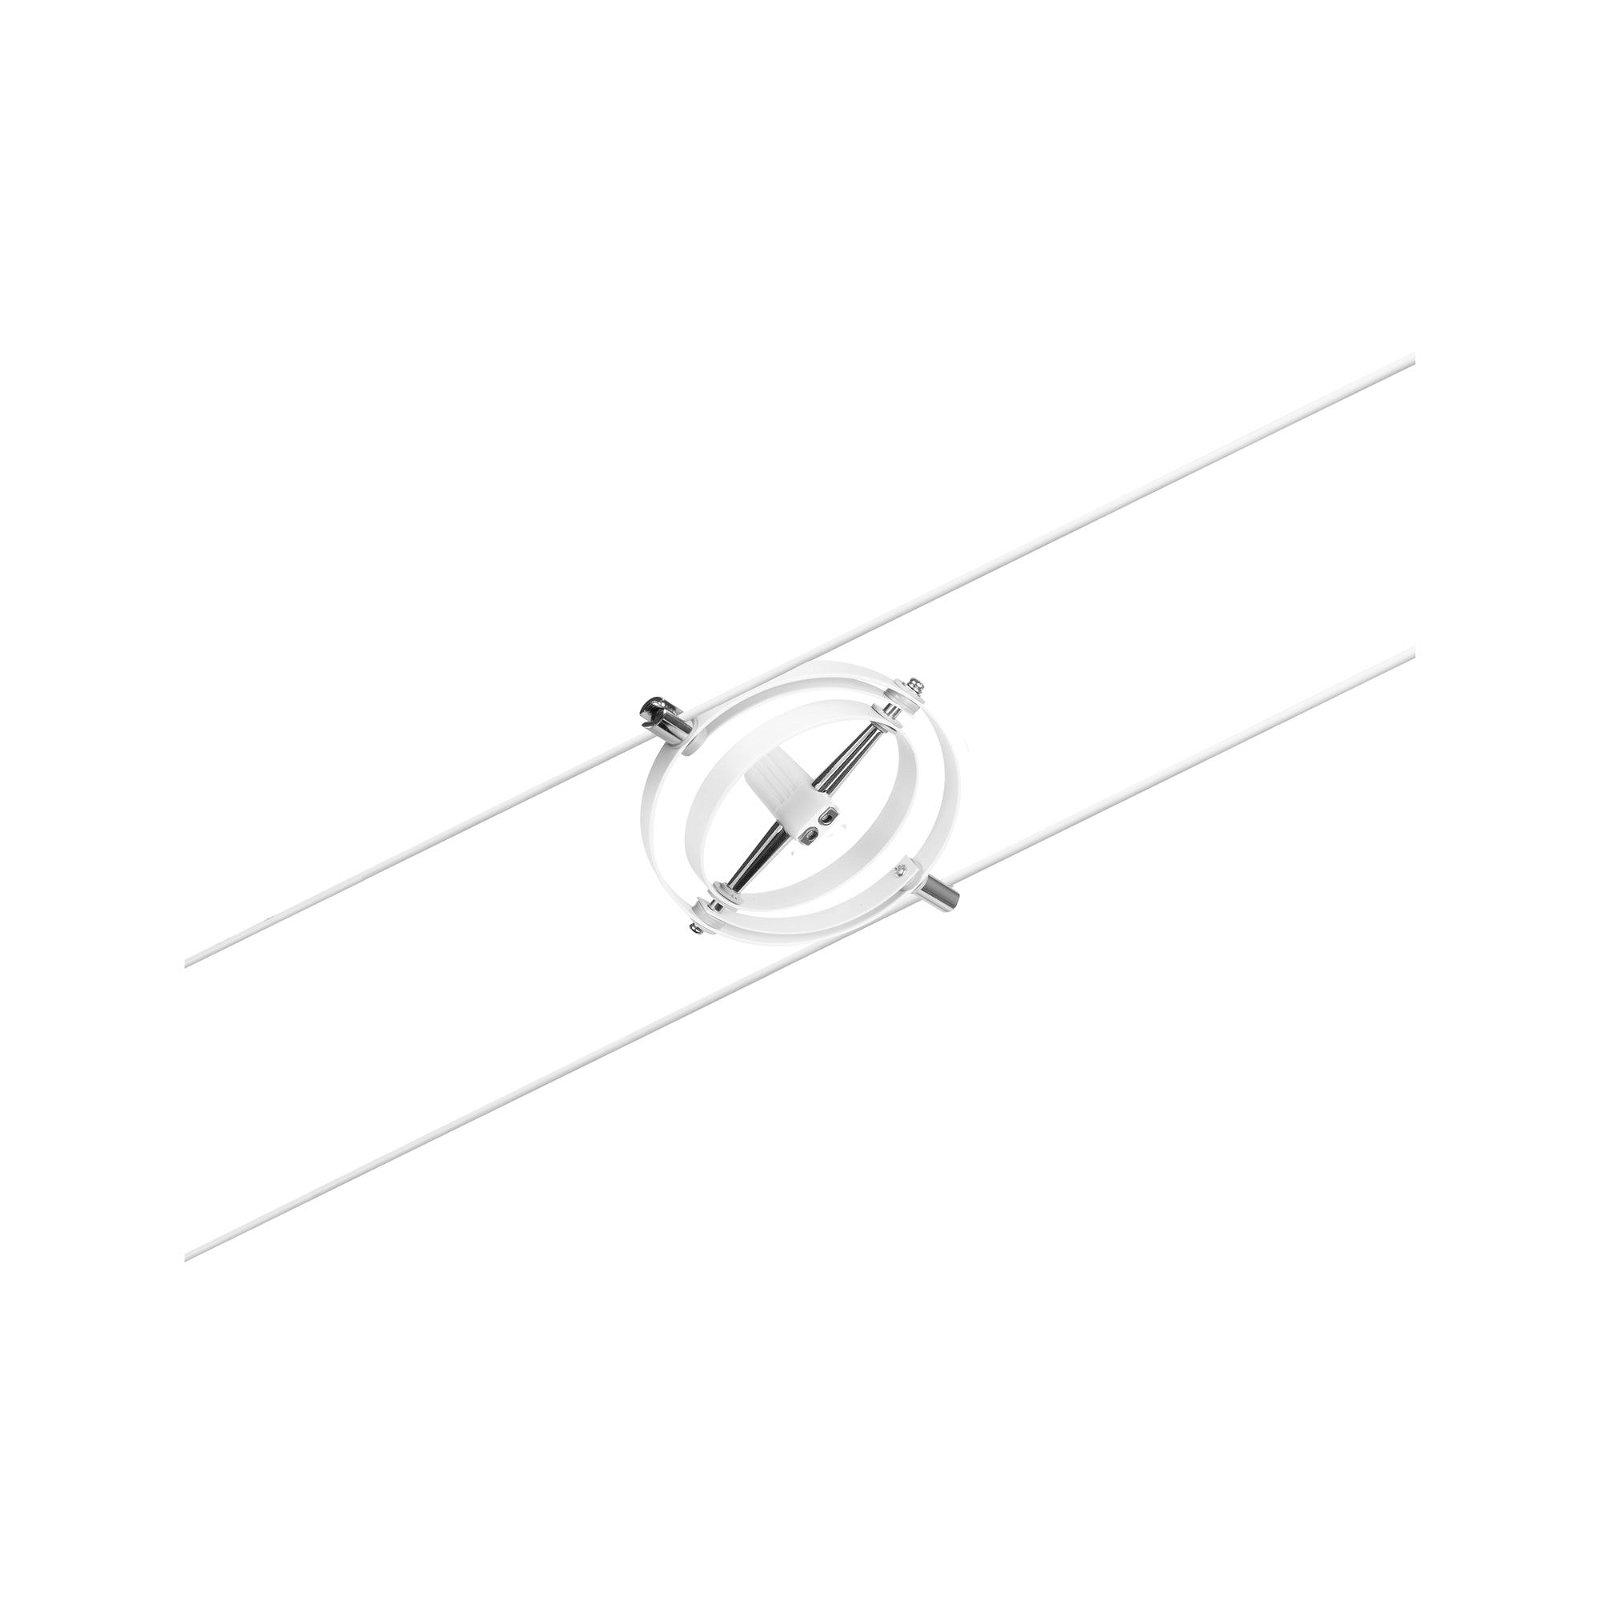 Seilsystem Cardan Einzelspot GU5,3 max. 10W 12V Weiß matt/Chrom